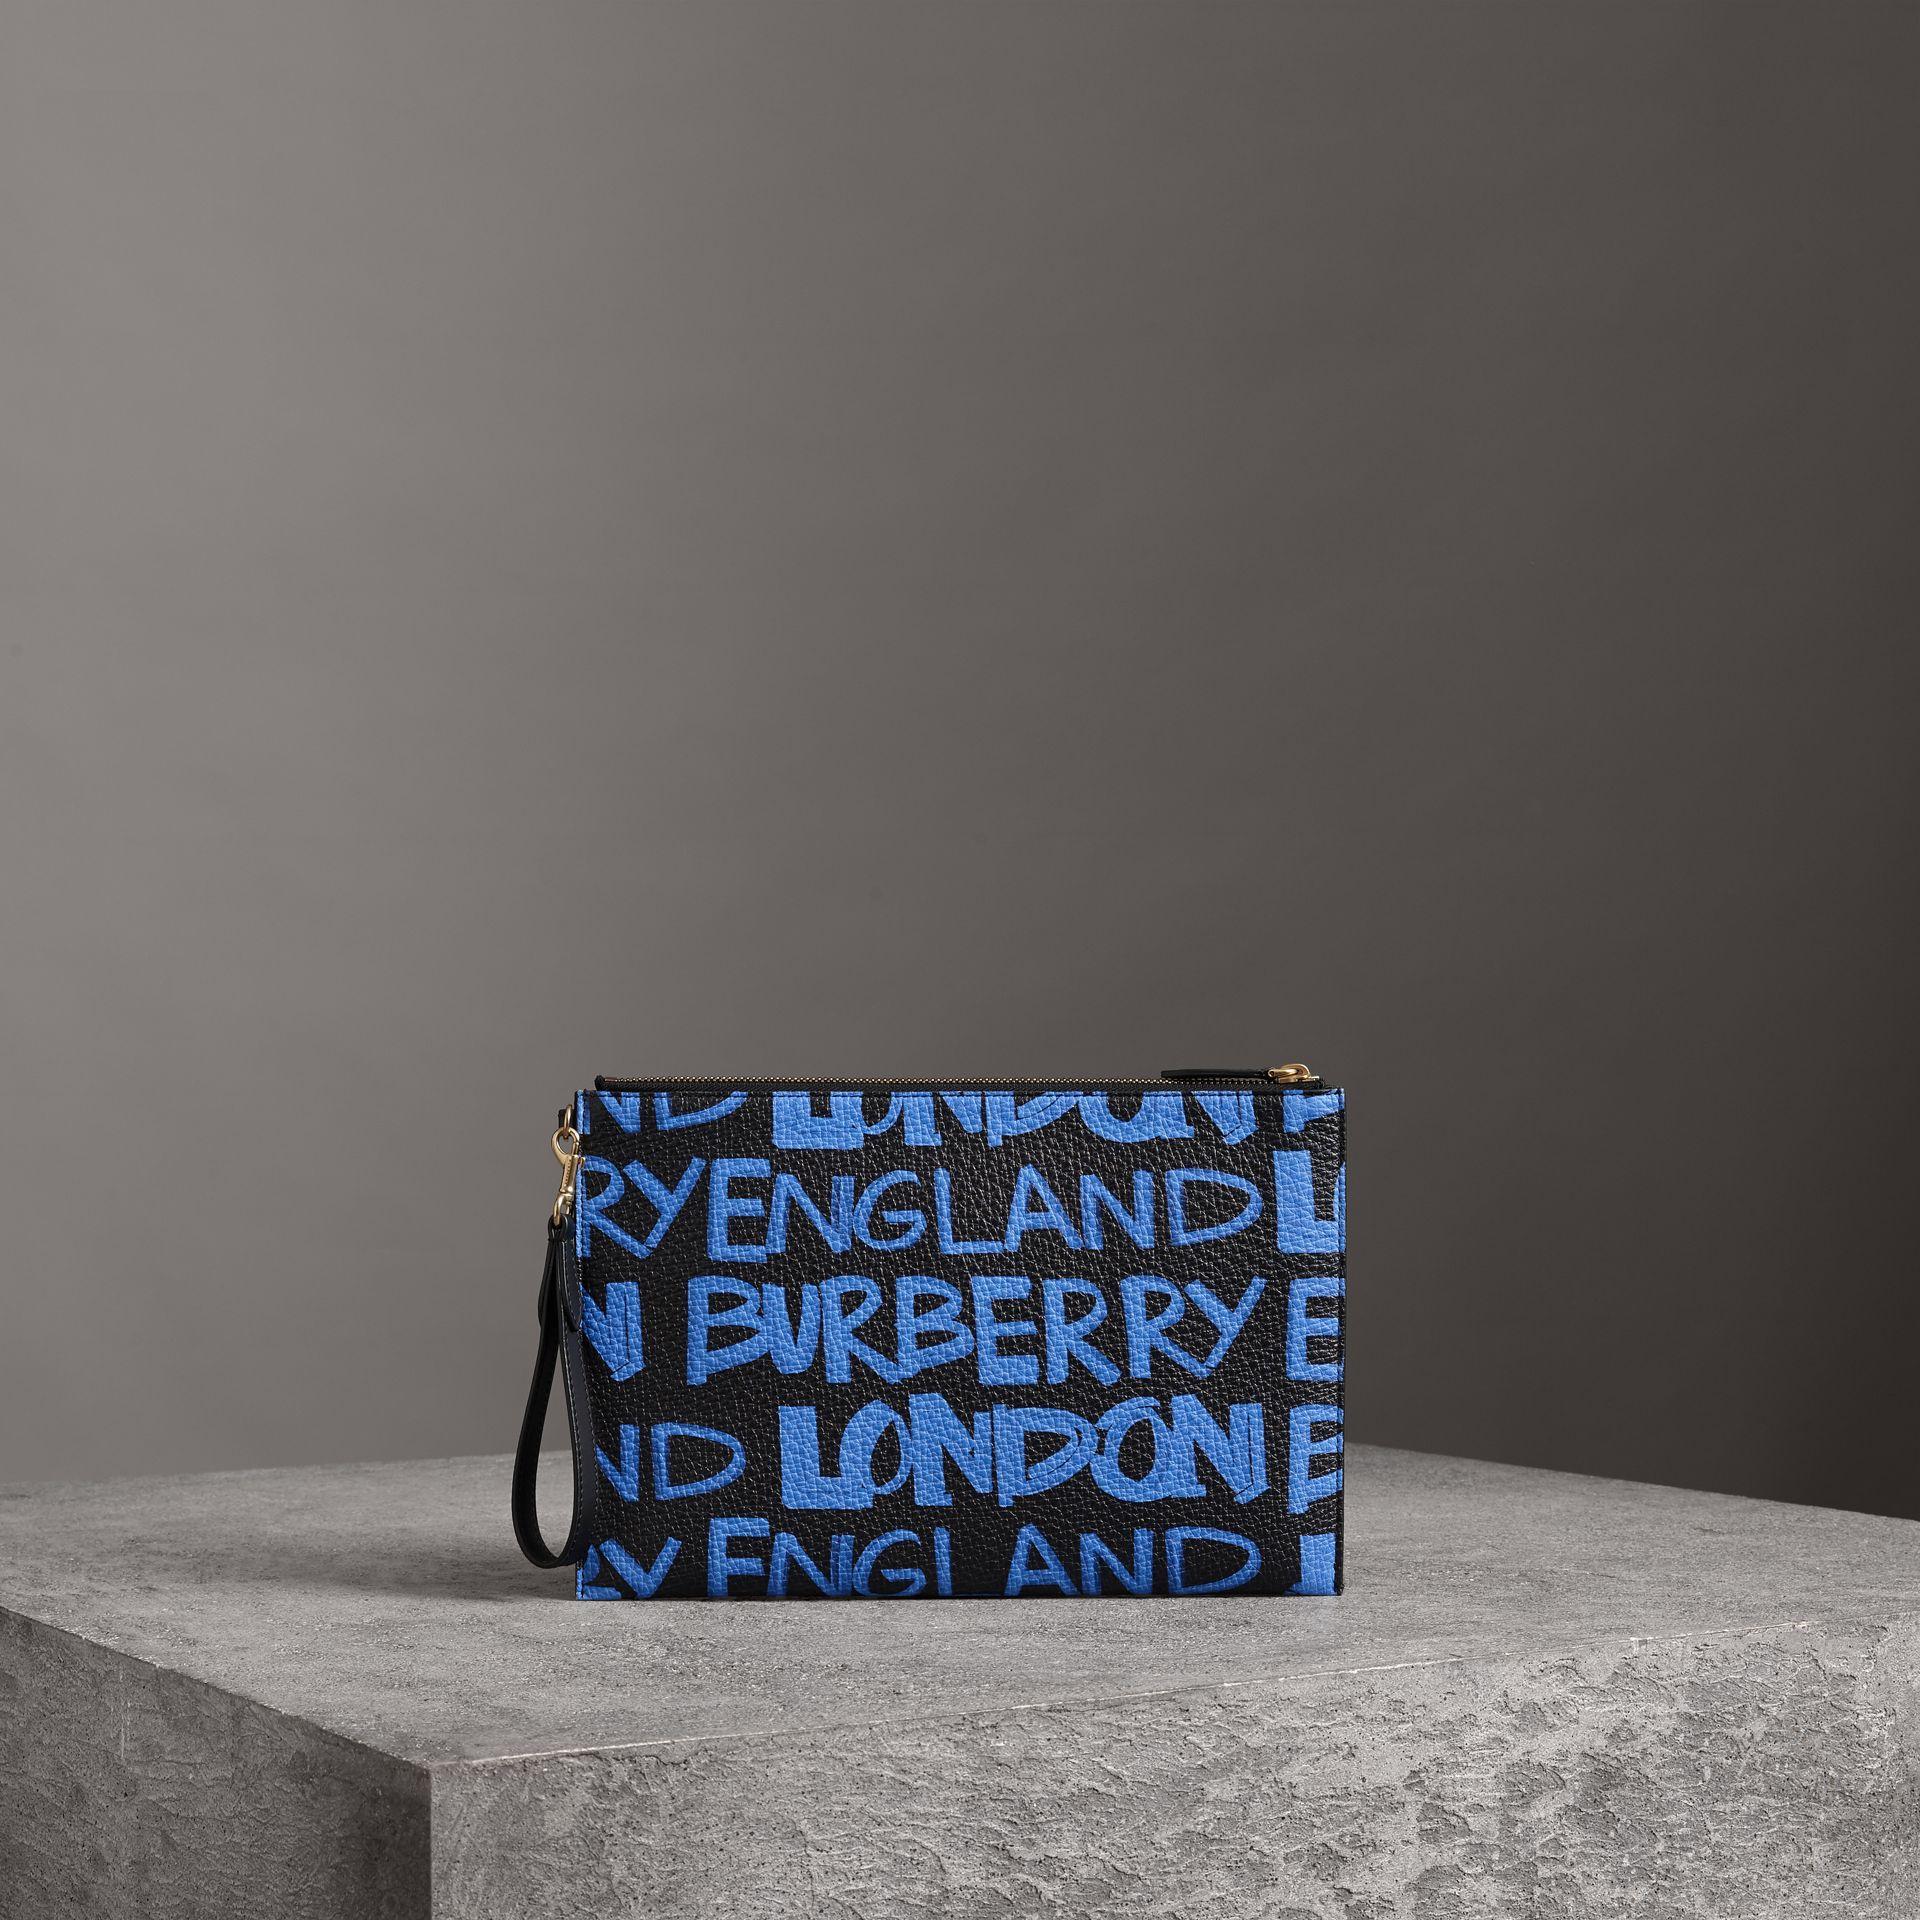 Burberry Graffiti Print Leather Zip Pouch In Blue/Black